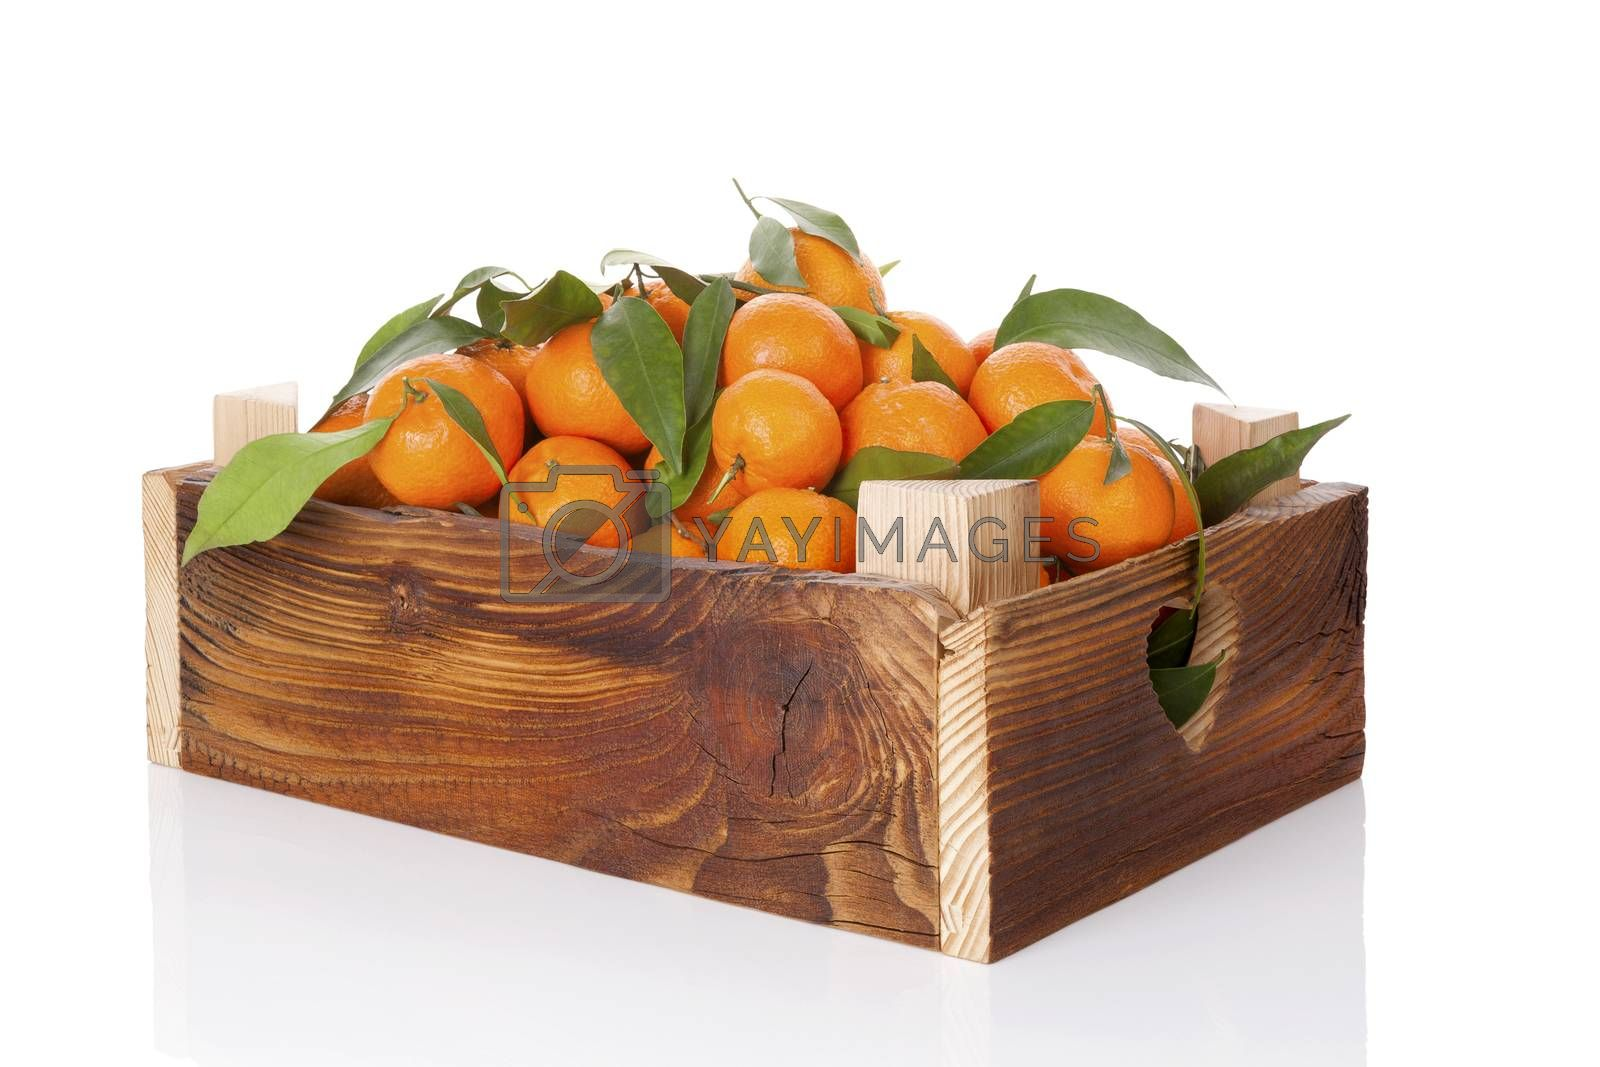 Fresh ripe mandarines with green leaves in wooden crate. Organic fresh mandarines, healthy fruit eating.